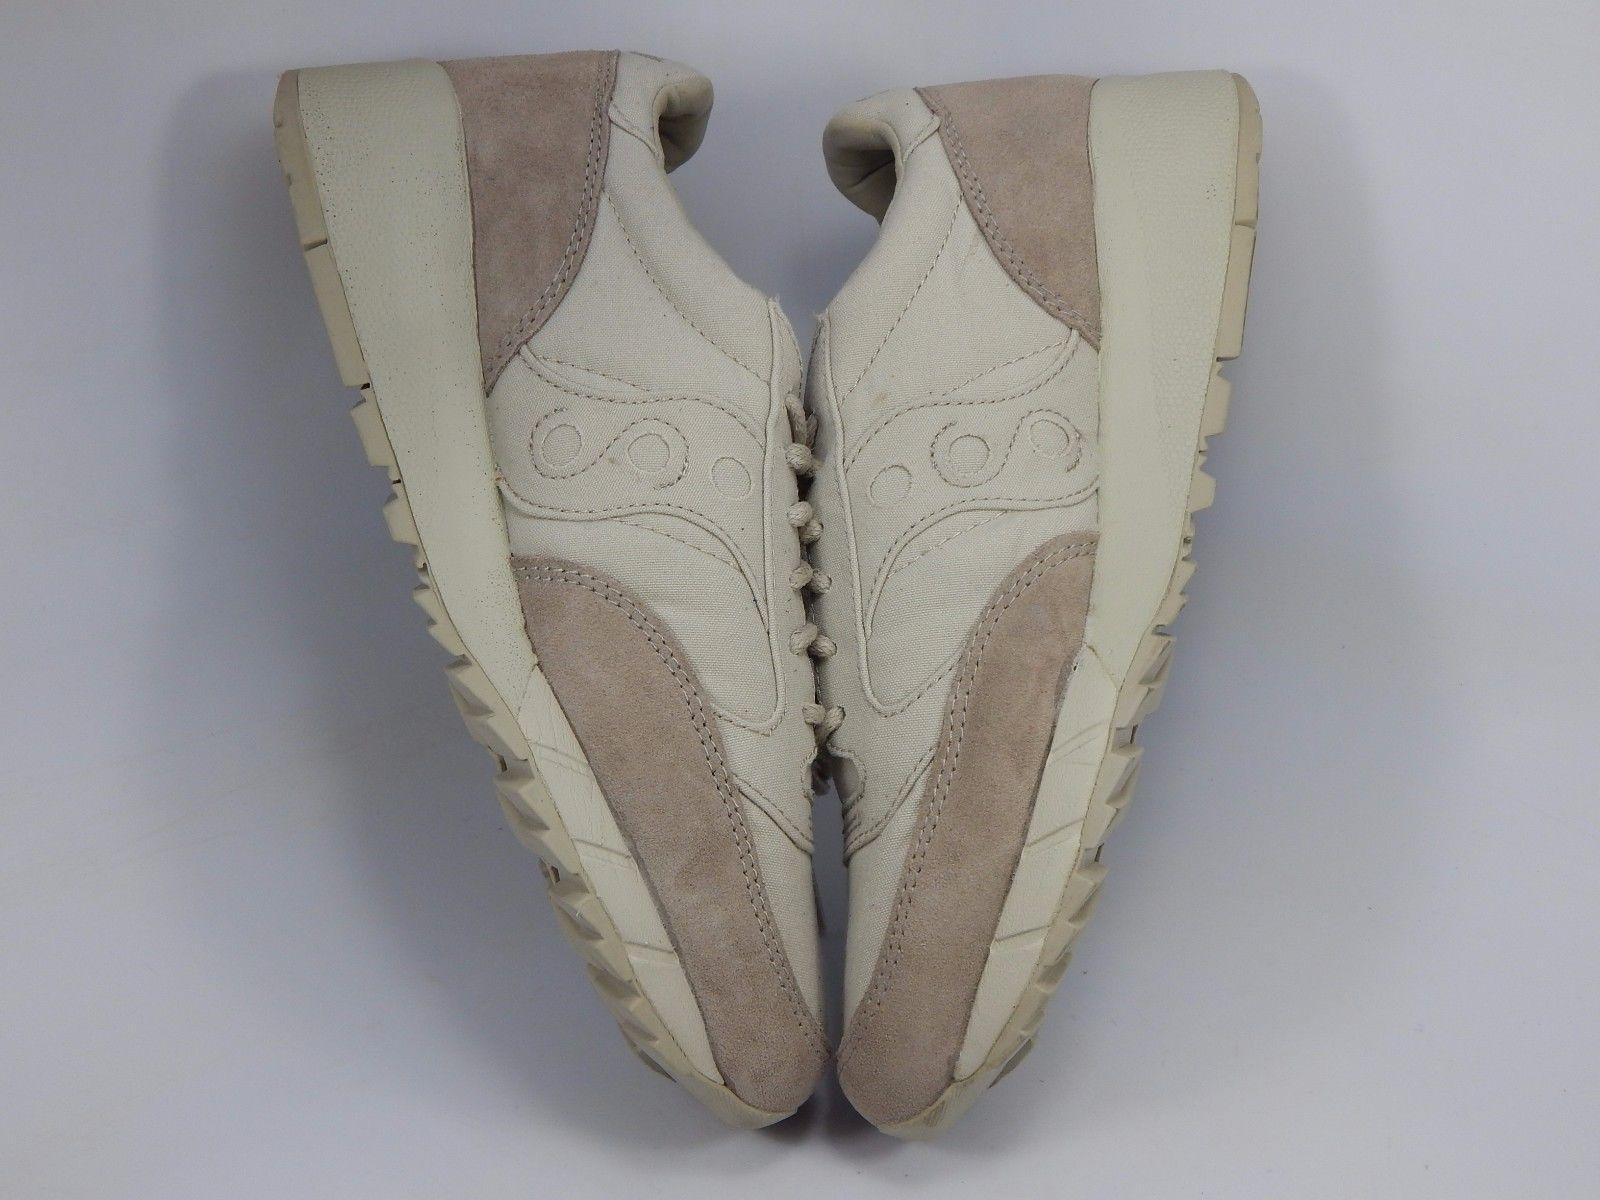 Saucony Original Jazz 91 Men's Running Shoes Size US 9 M (D) EU 42.5 S70216-5